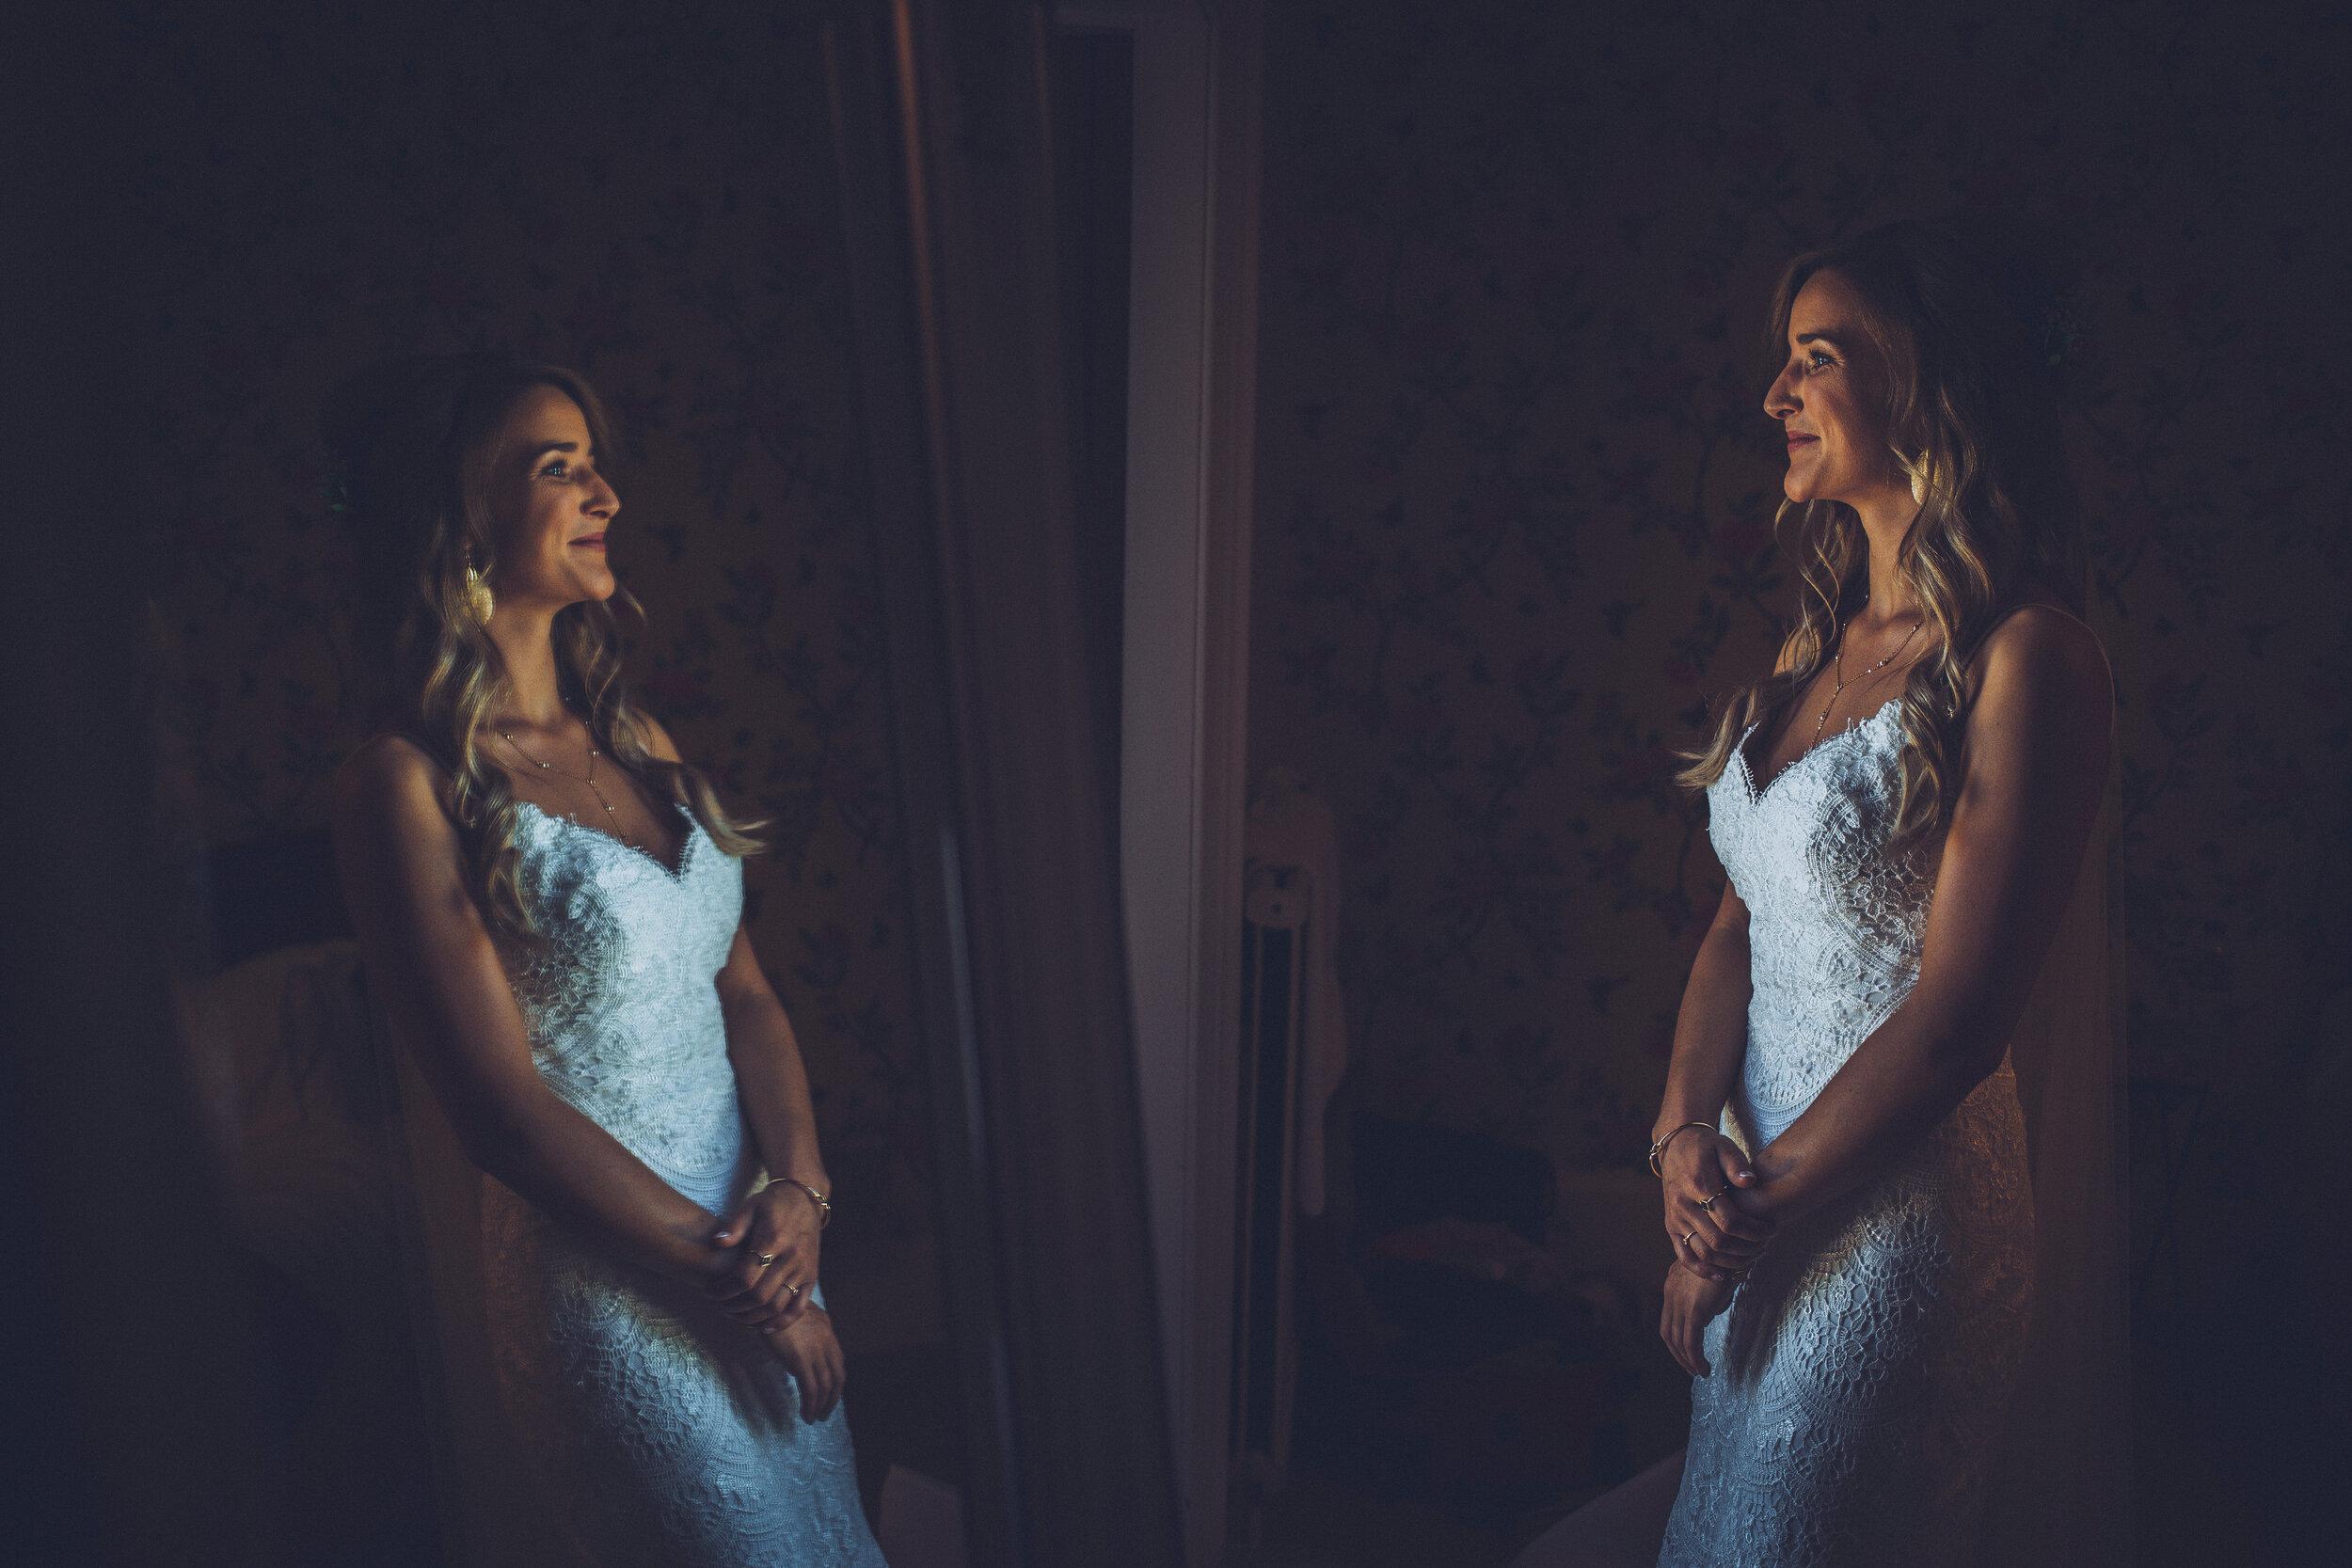 Dalduff Farm Ayrshire Wedding Photography - Claire Basiuk Photographer - 02.jpg